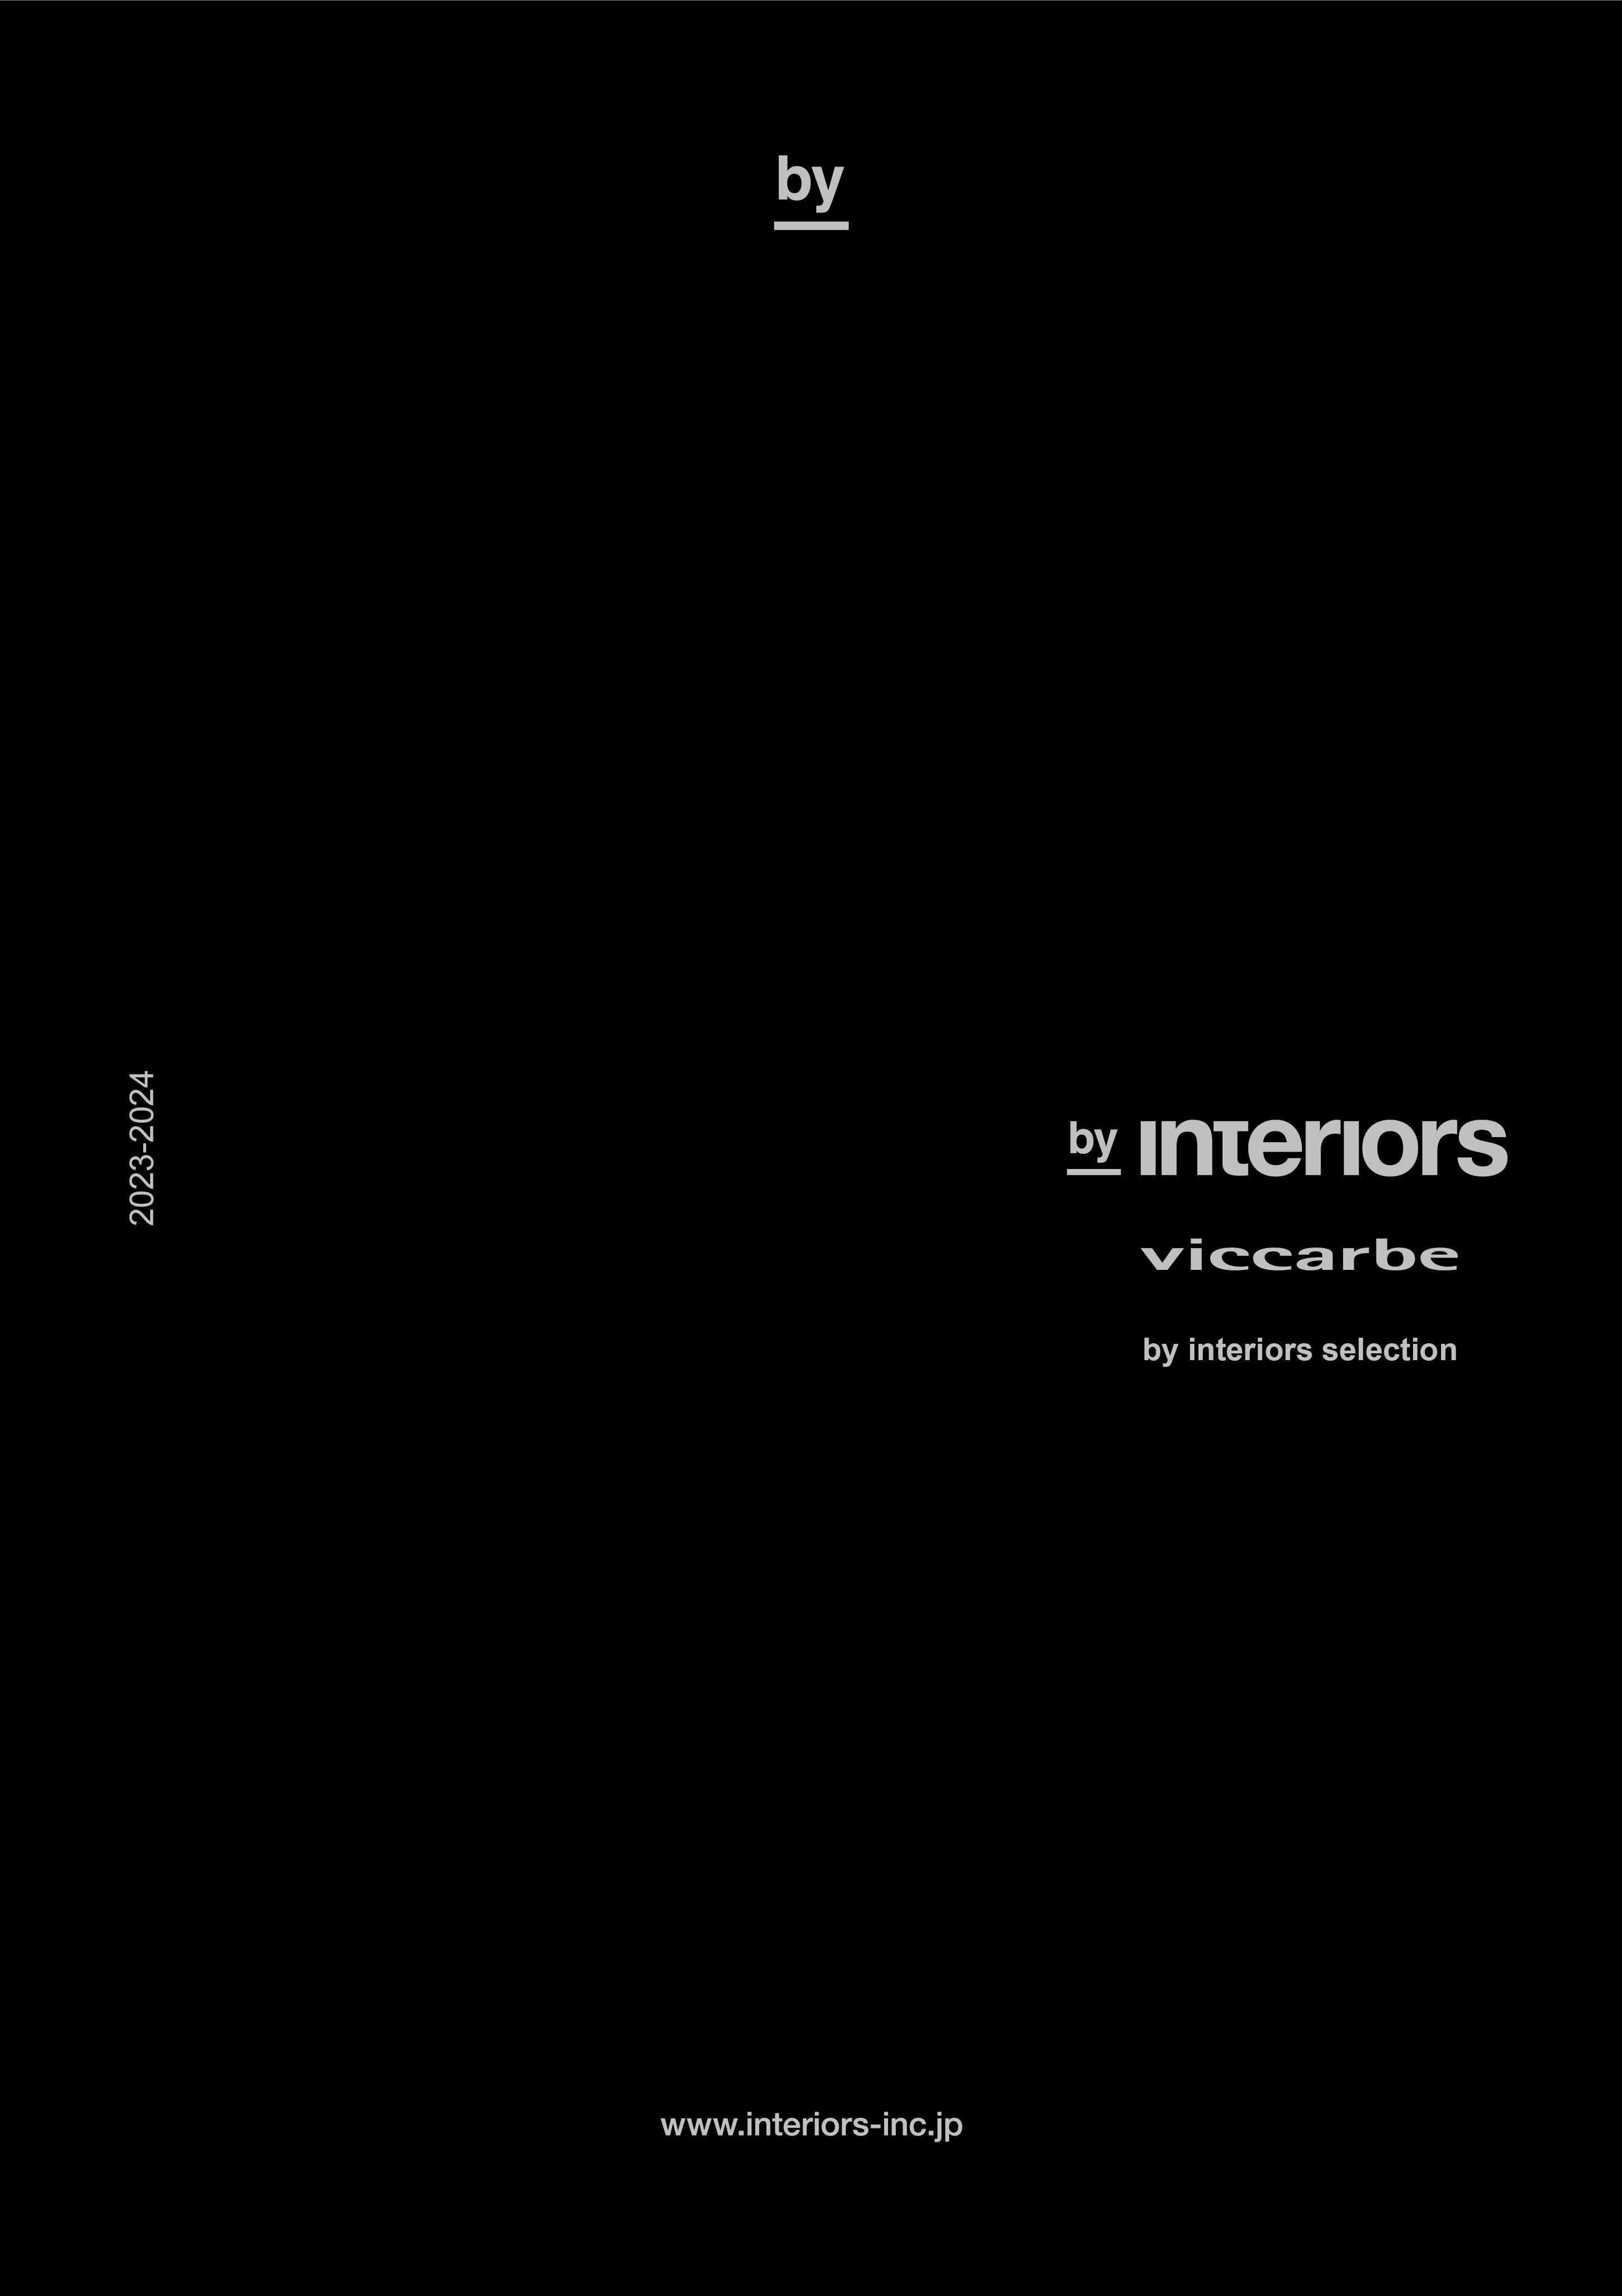 interiors / viccarbe